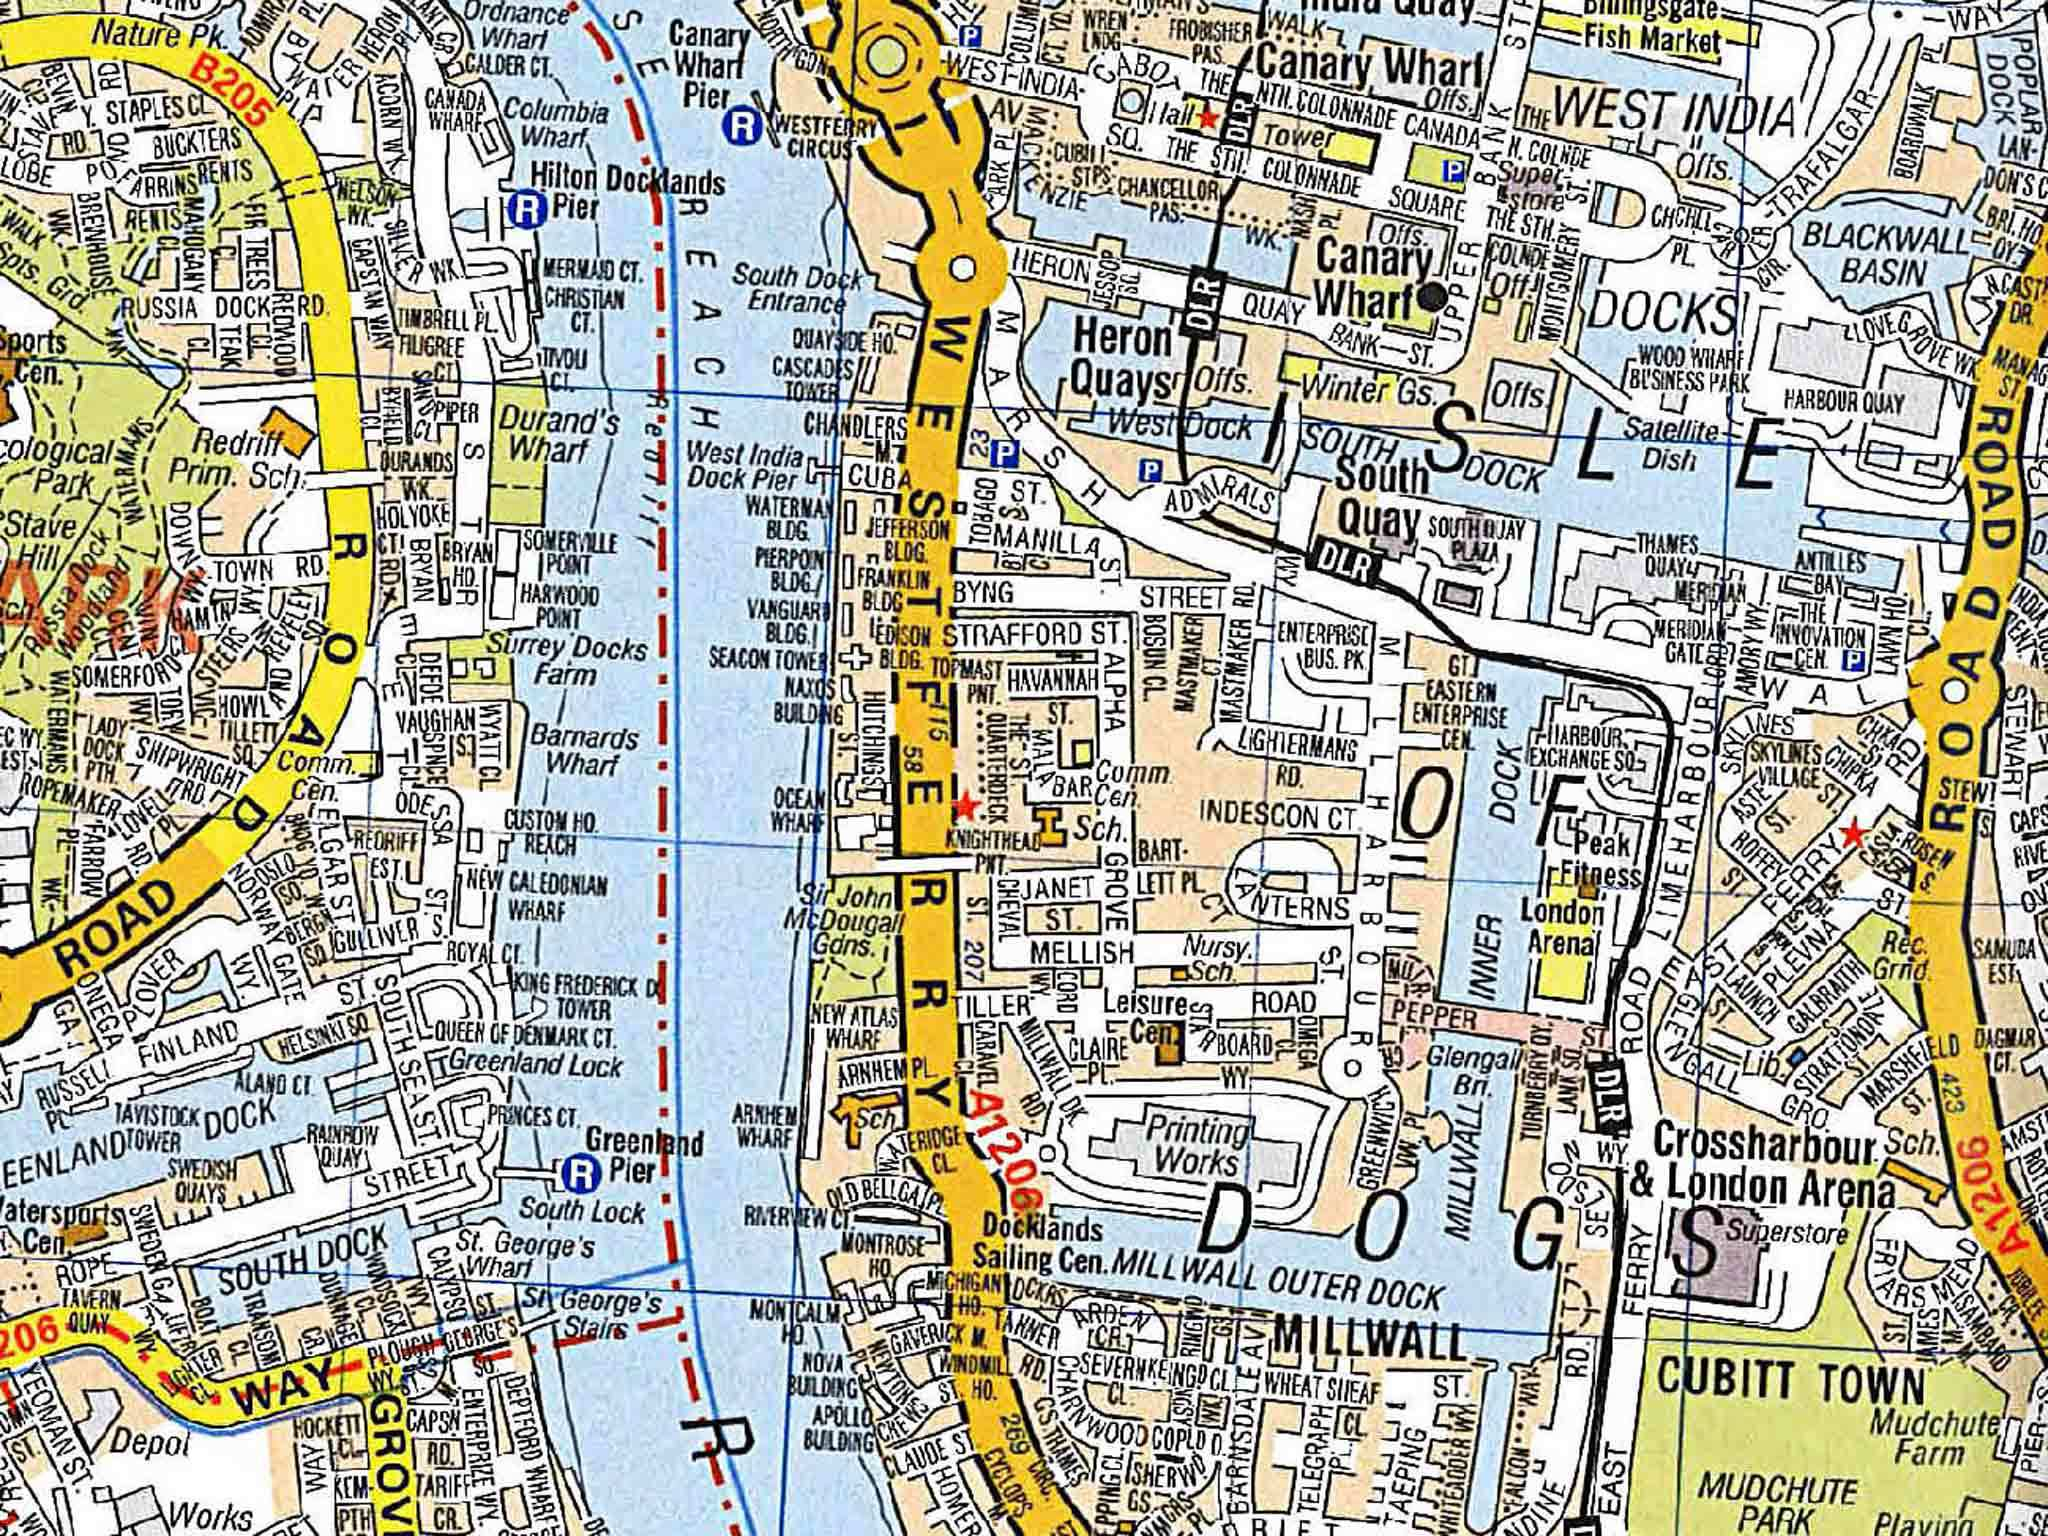 A-Z Street Atlas - Phyllis Pearsall - Ten iconic London designs